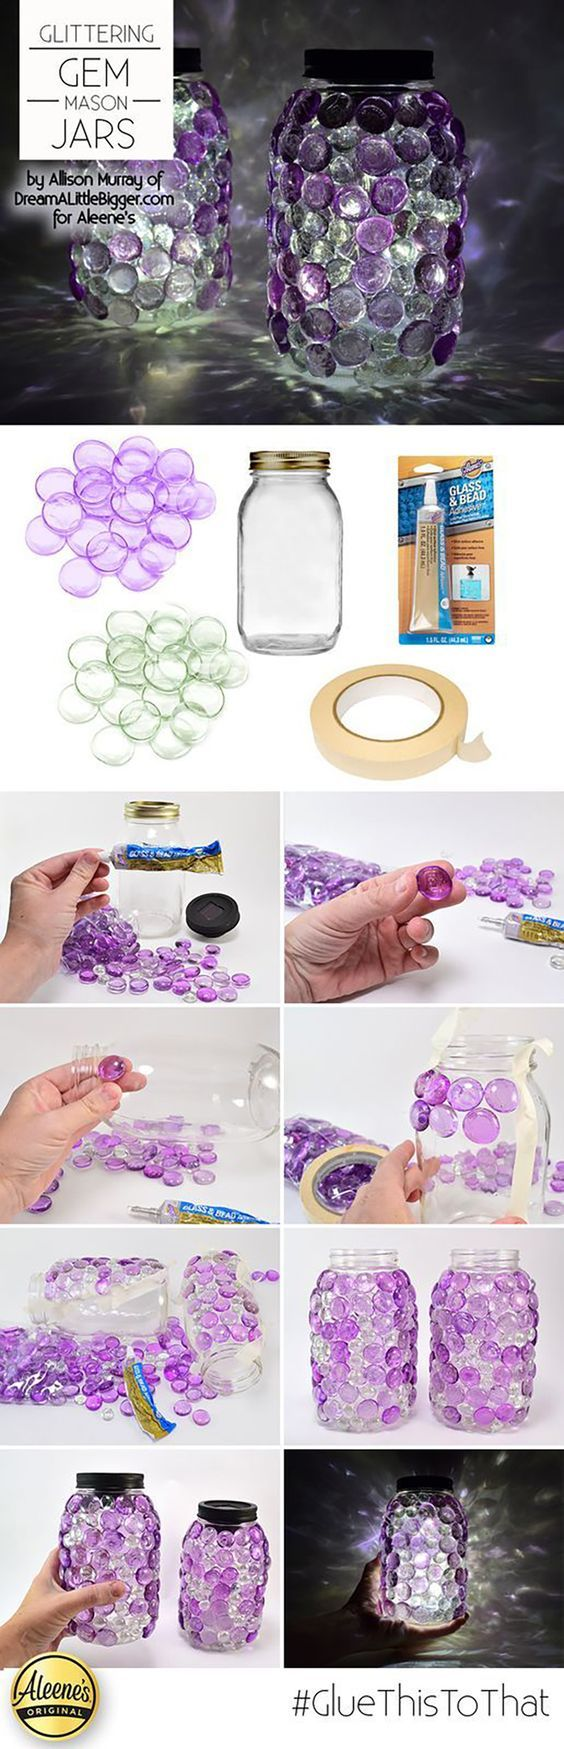 Glittering Gem Mason Jar Lights | iLoveToCreate